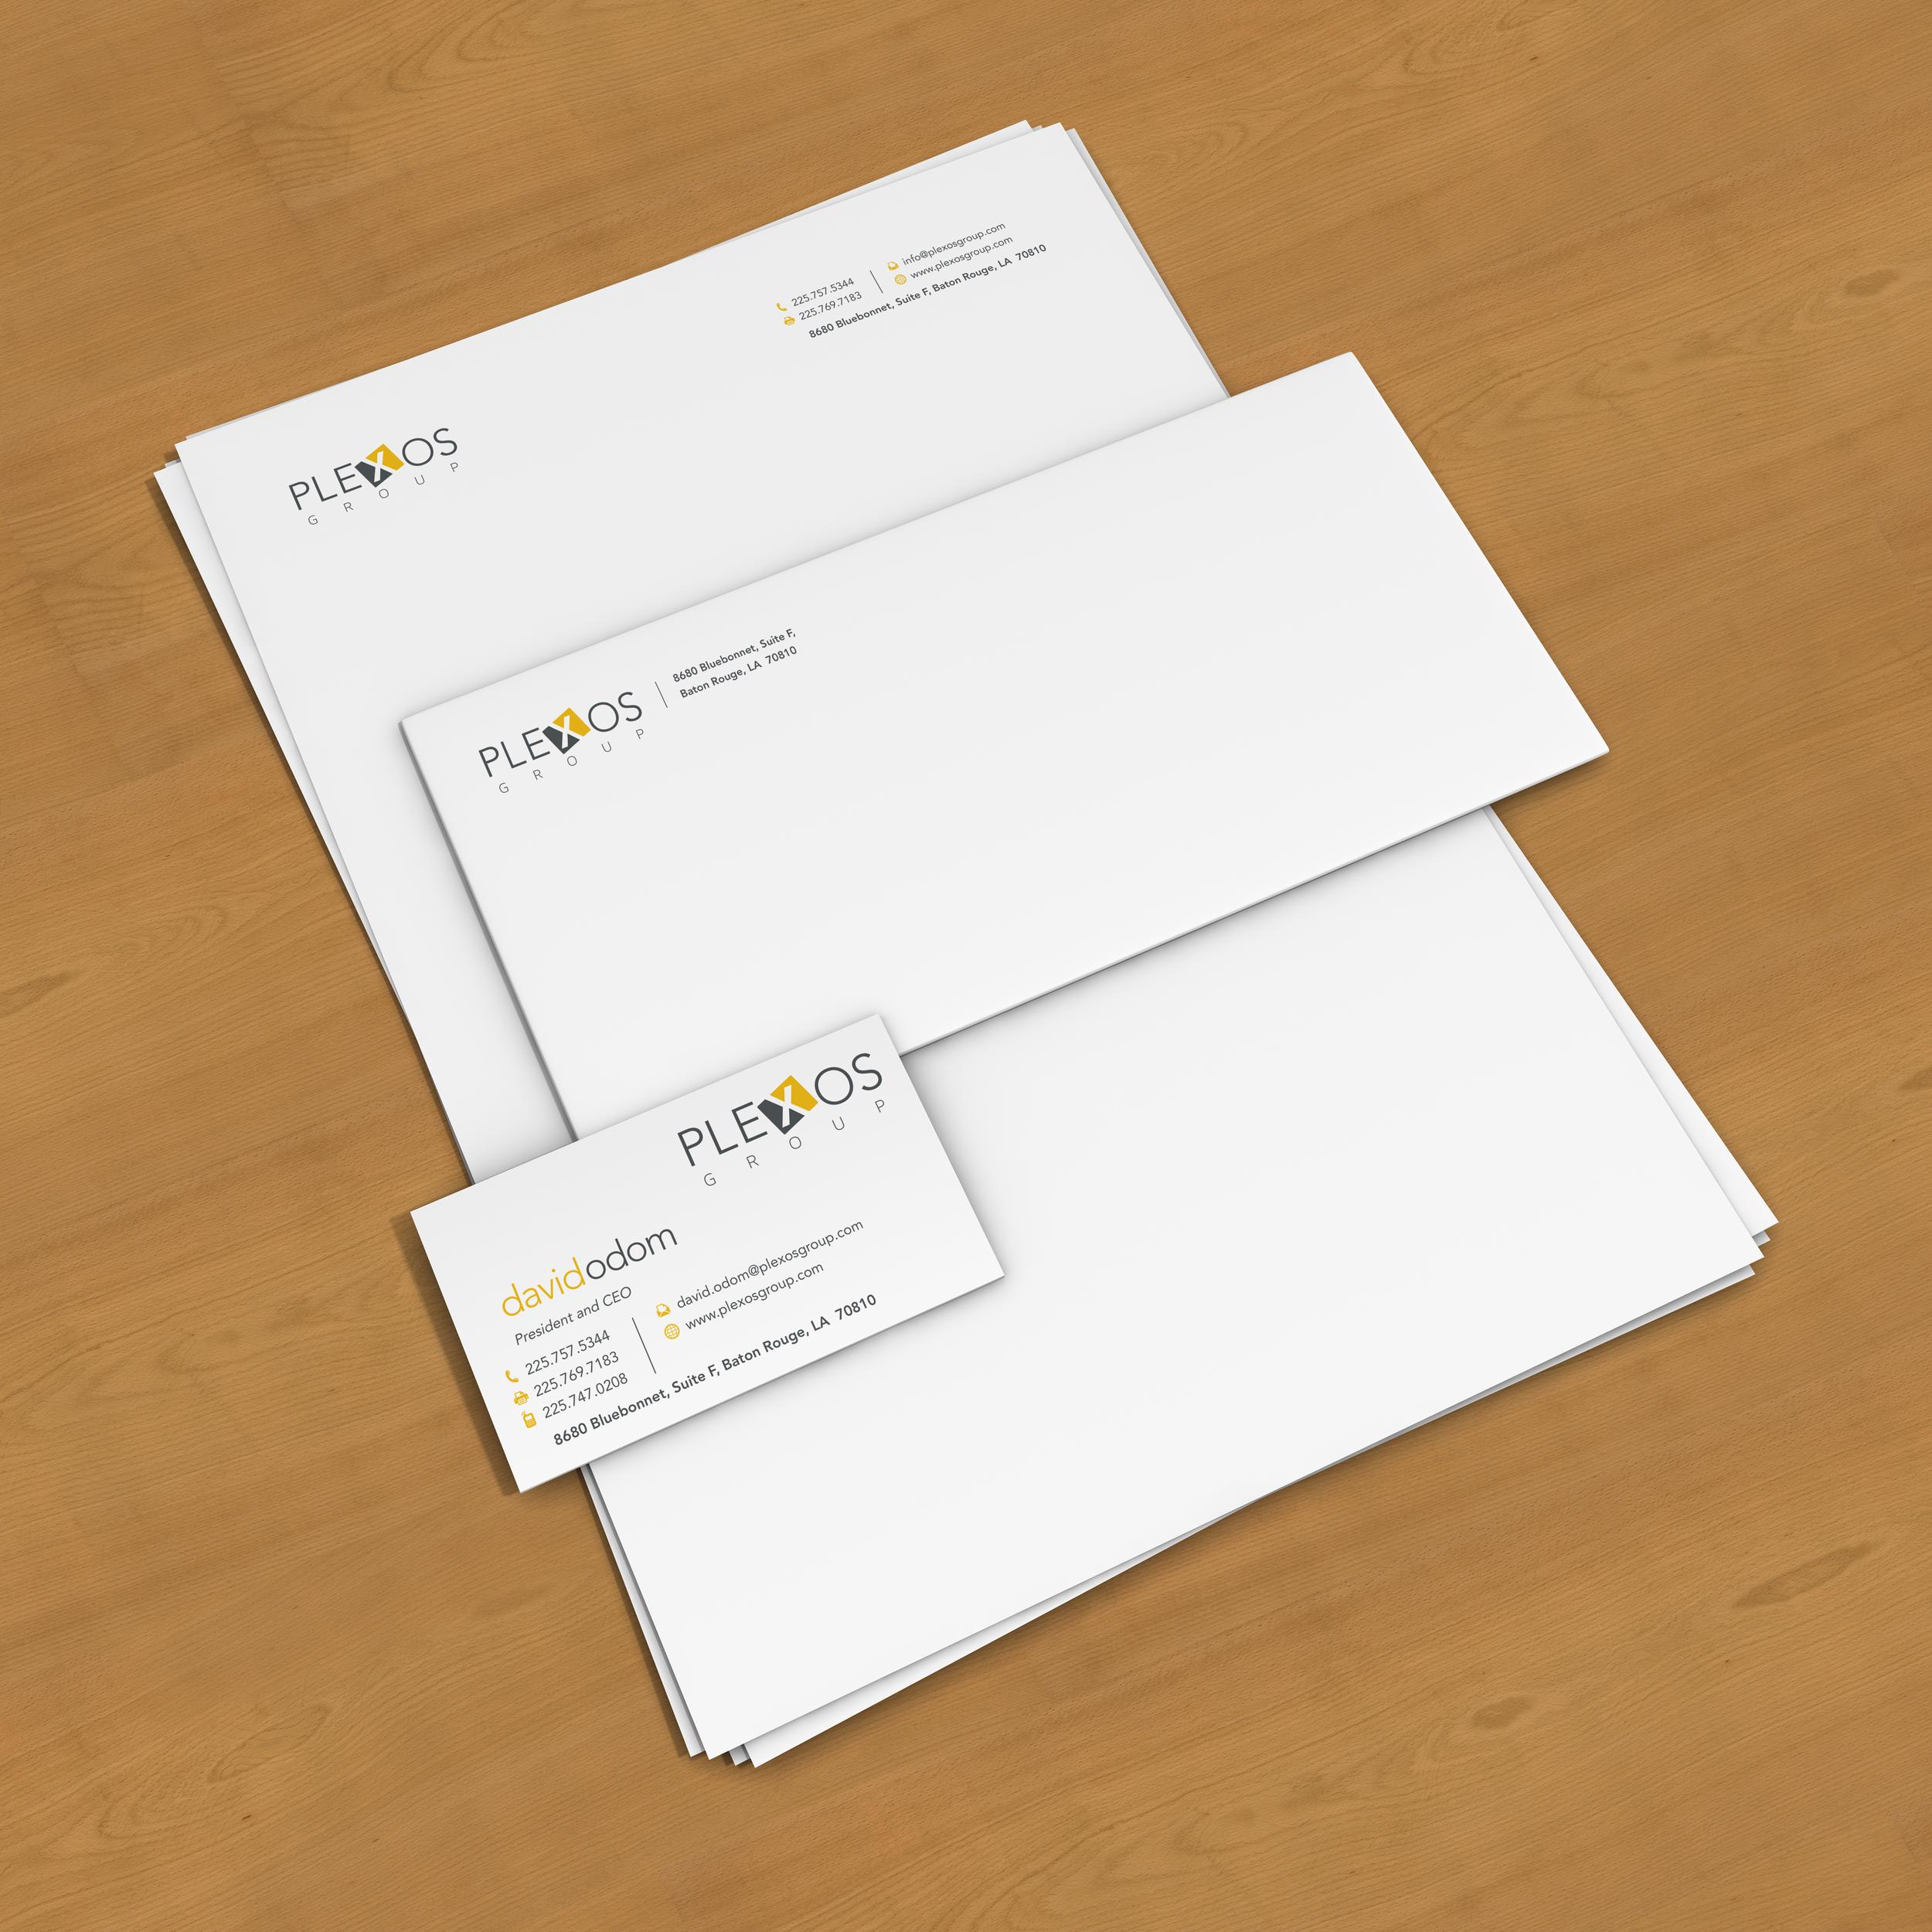 Stationery Design for Plexos Group